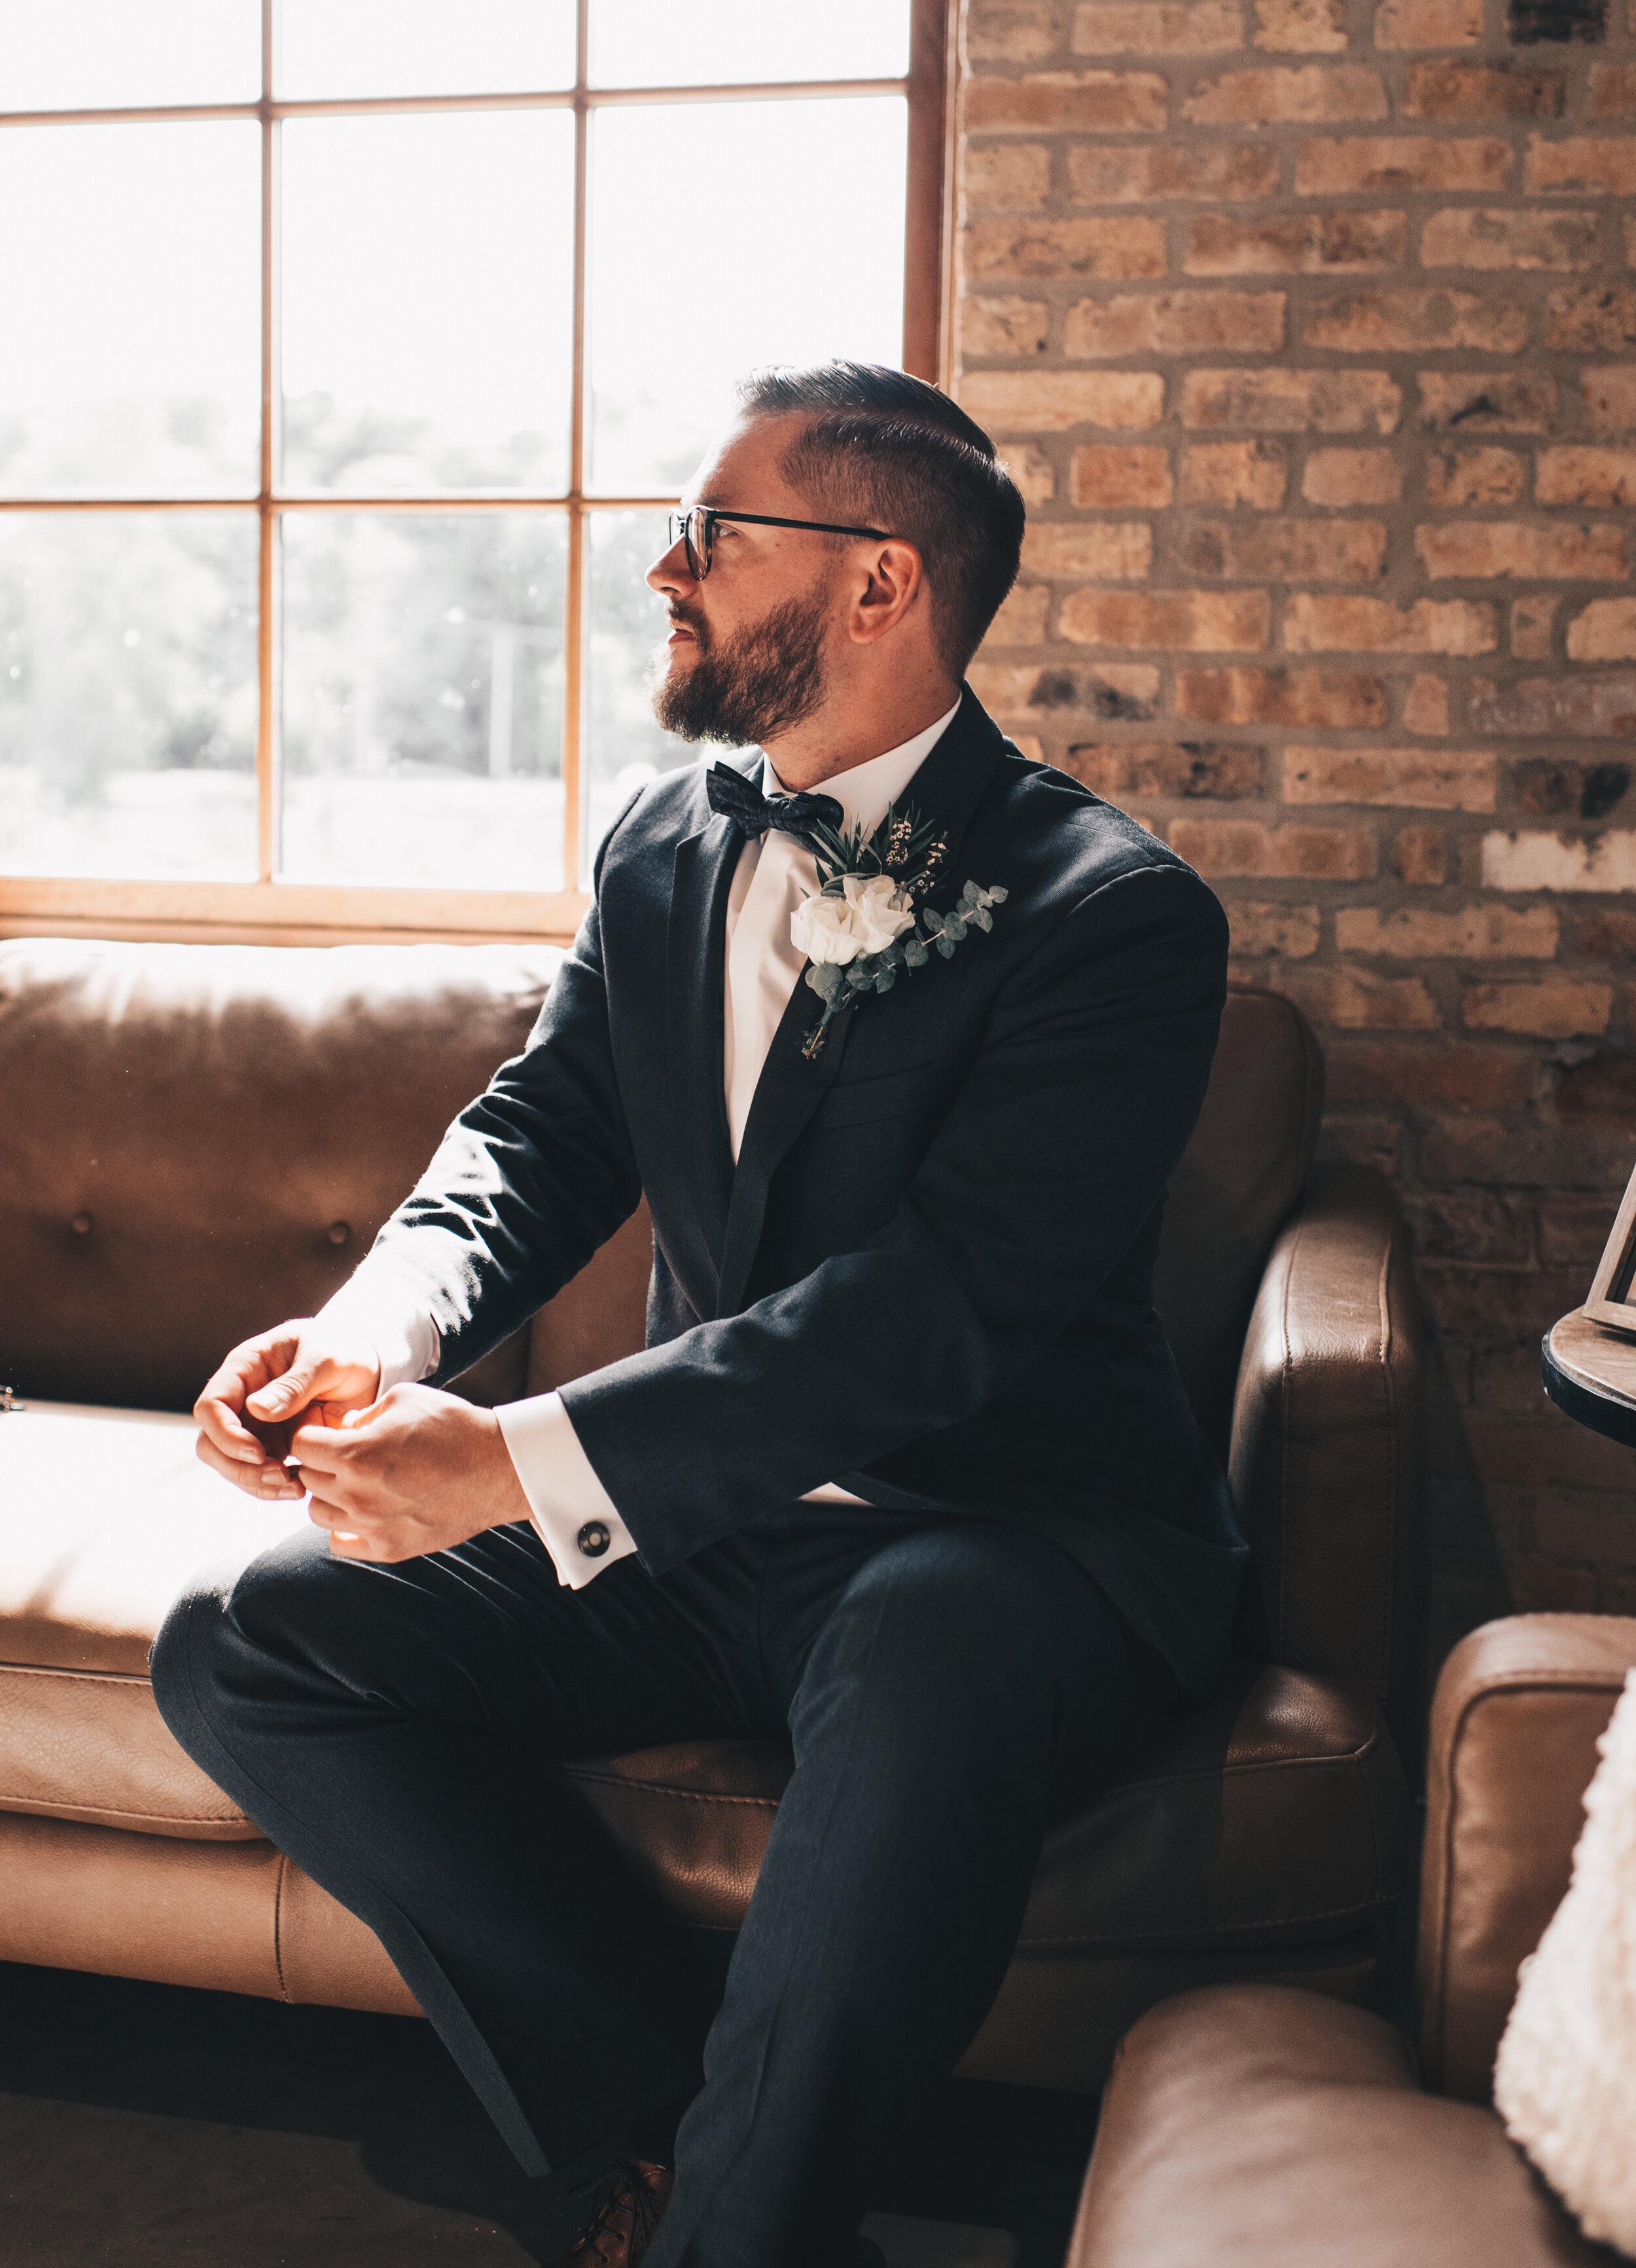 Modern Industrial Wedding, The Brix on the Fox, The BRIX, Groom Attire, Modern Midwest Wedding